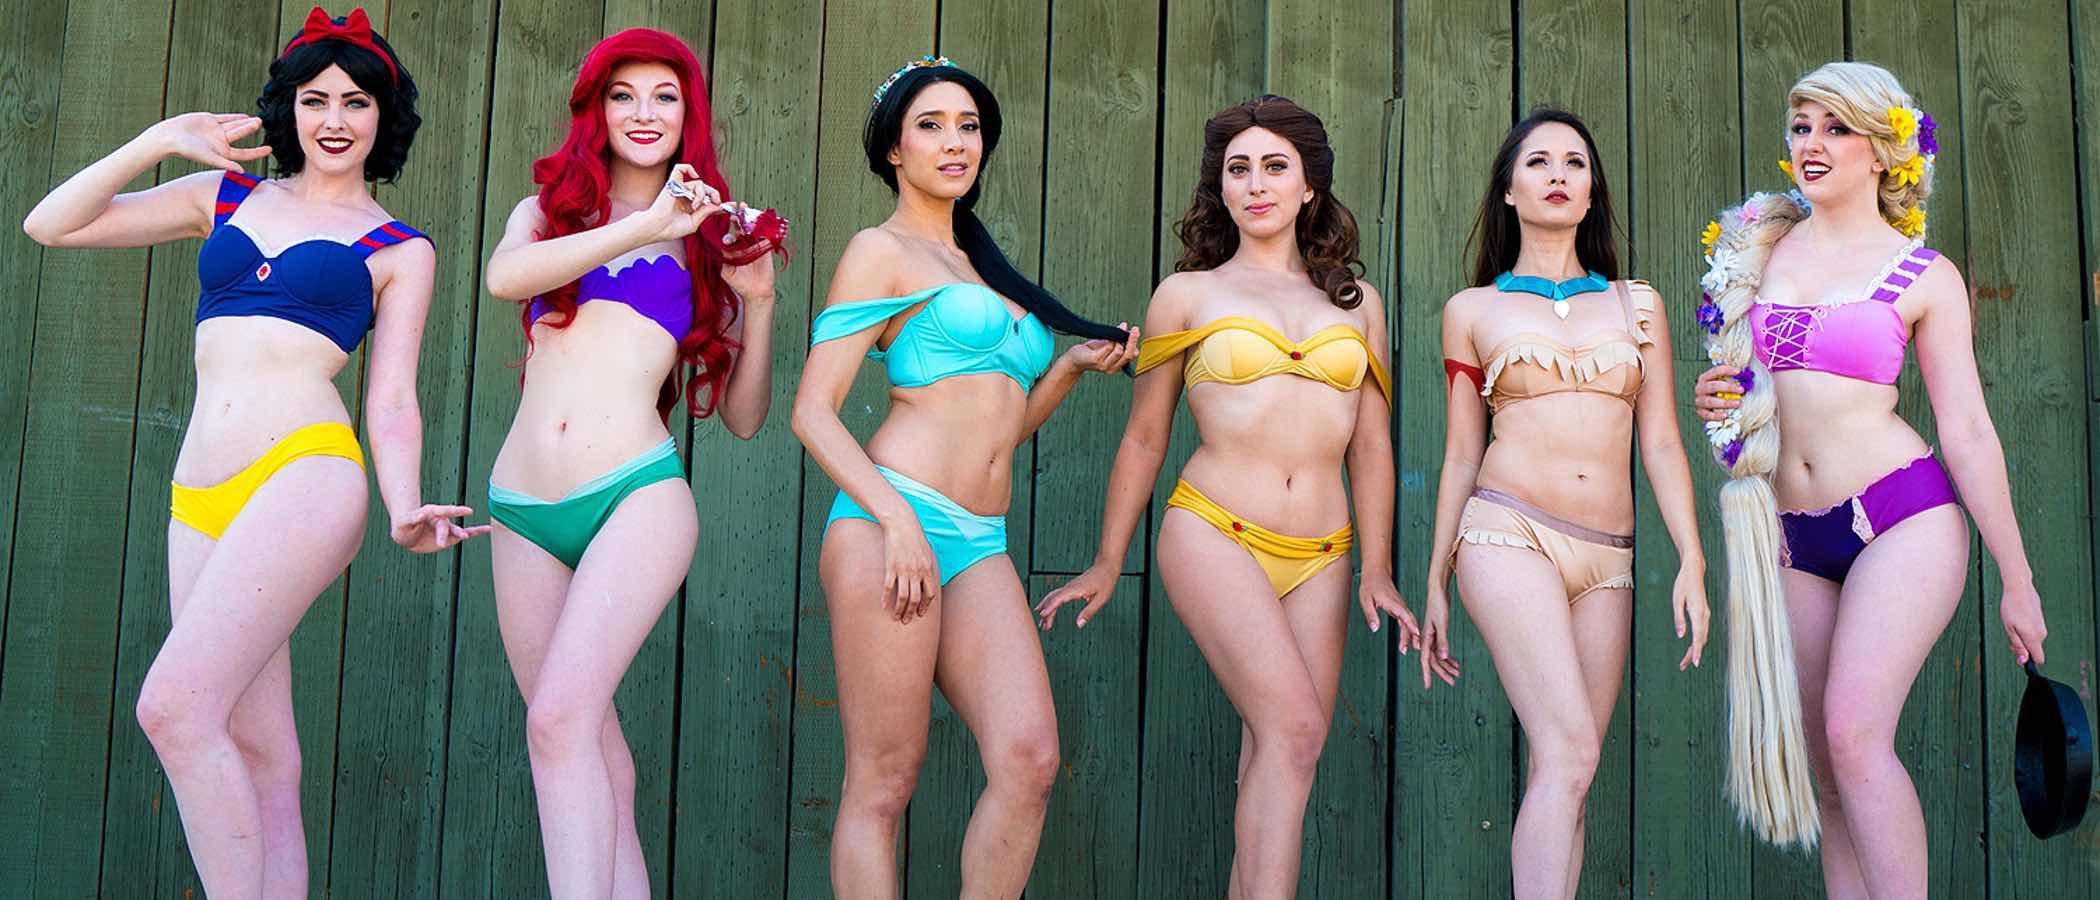 Este verano 2017 serás la Princesa de la playa con los bikinis de Princesas Disney